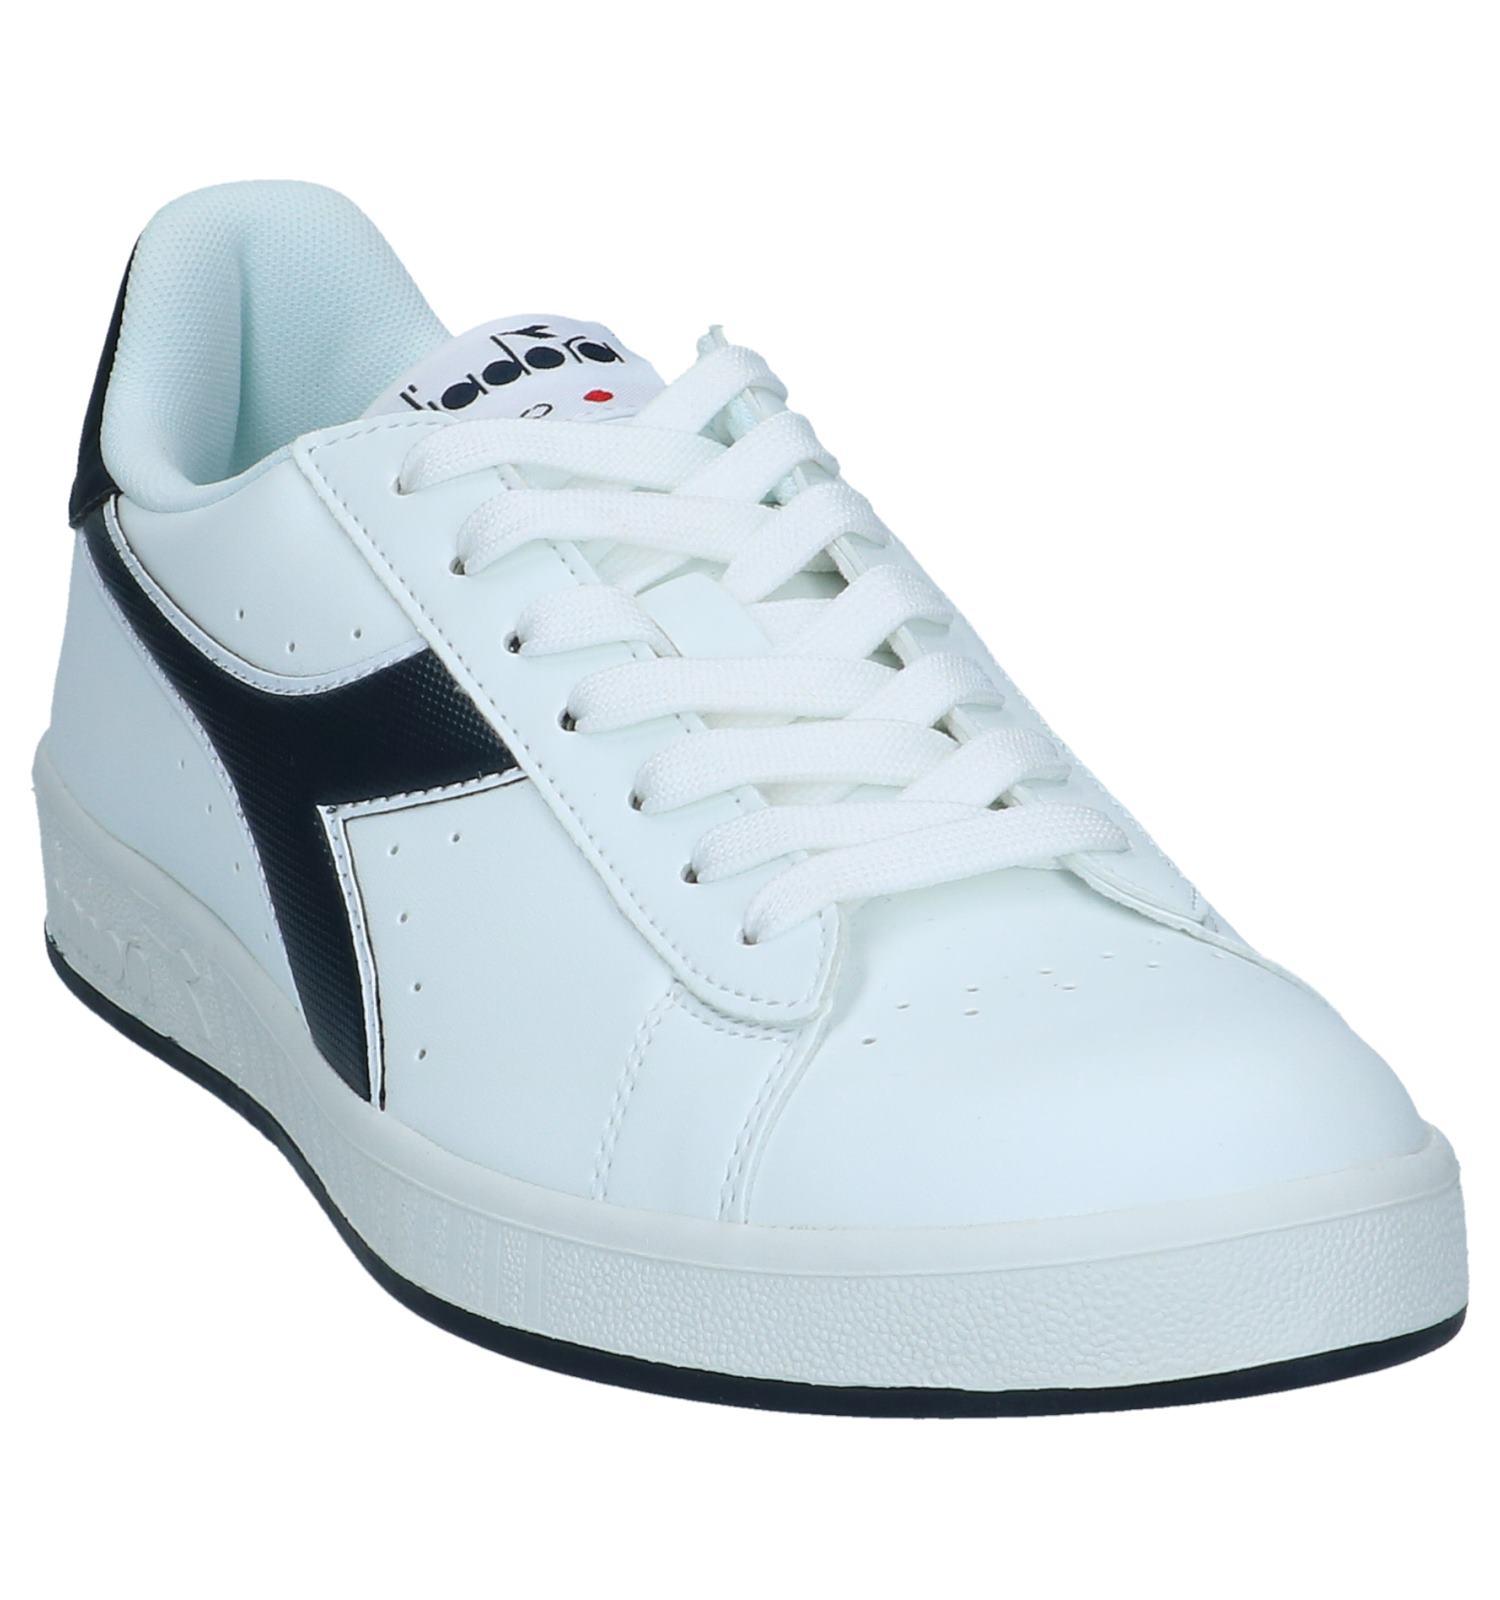 Witte Sneakers Diadora Game P | TORFS.BE | Gratis verzend en